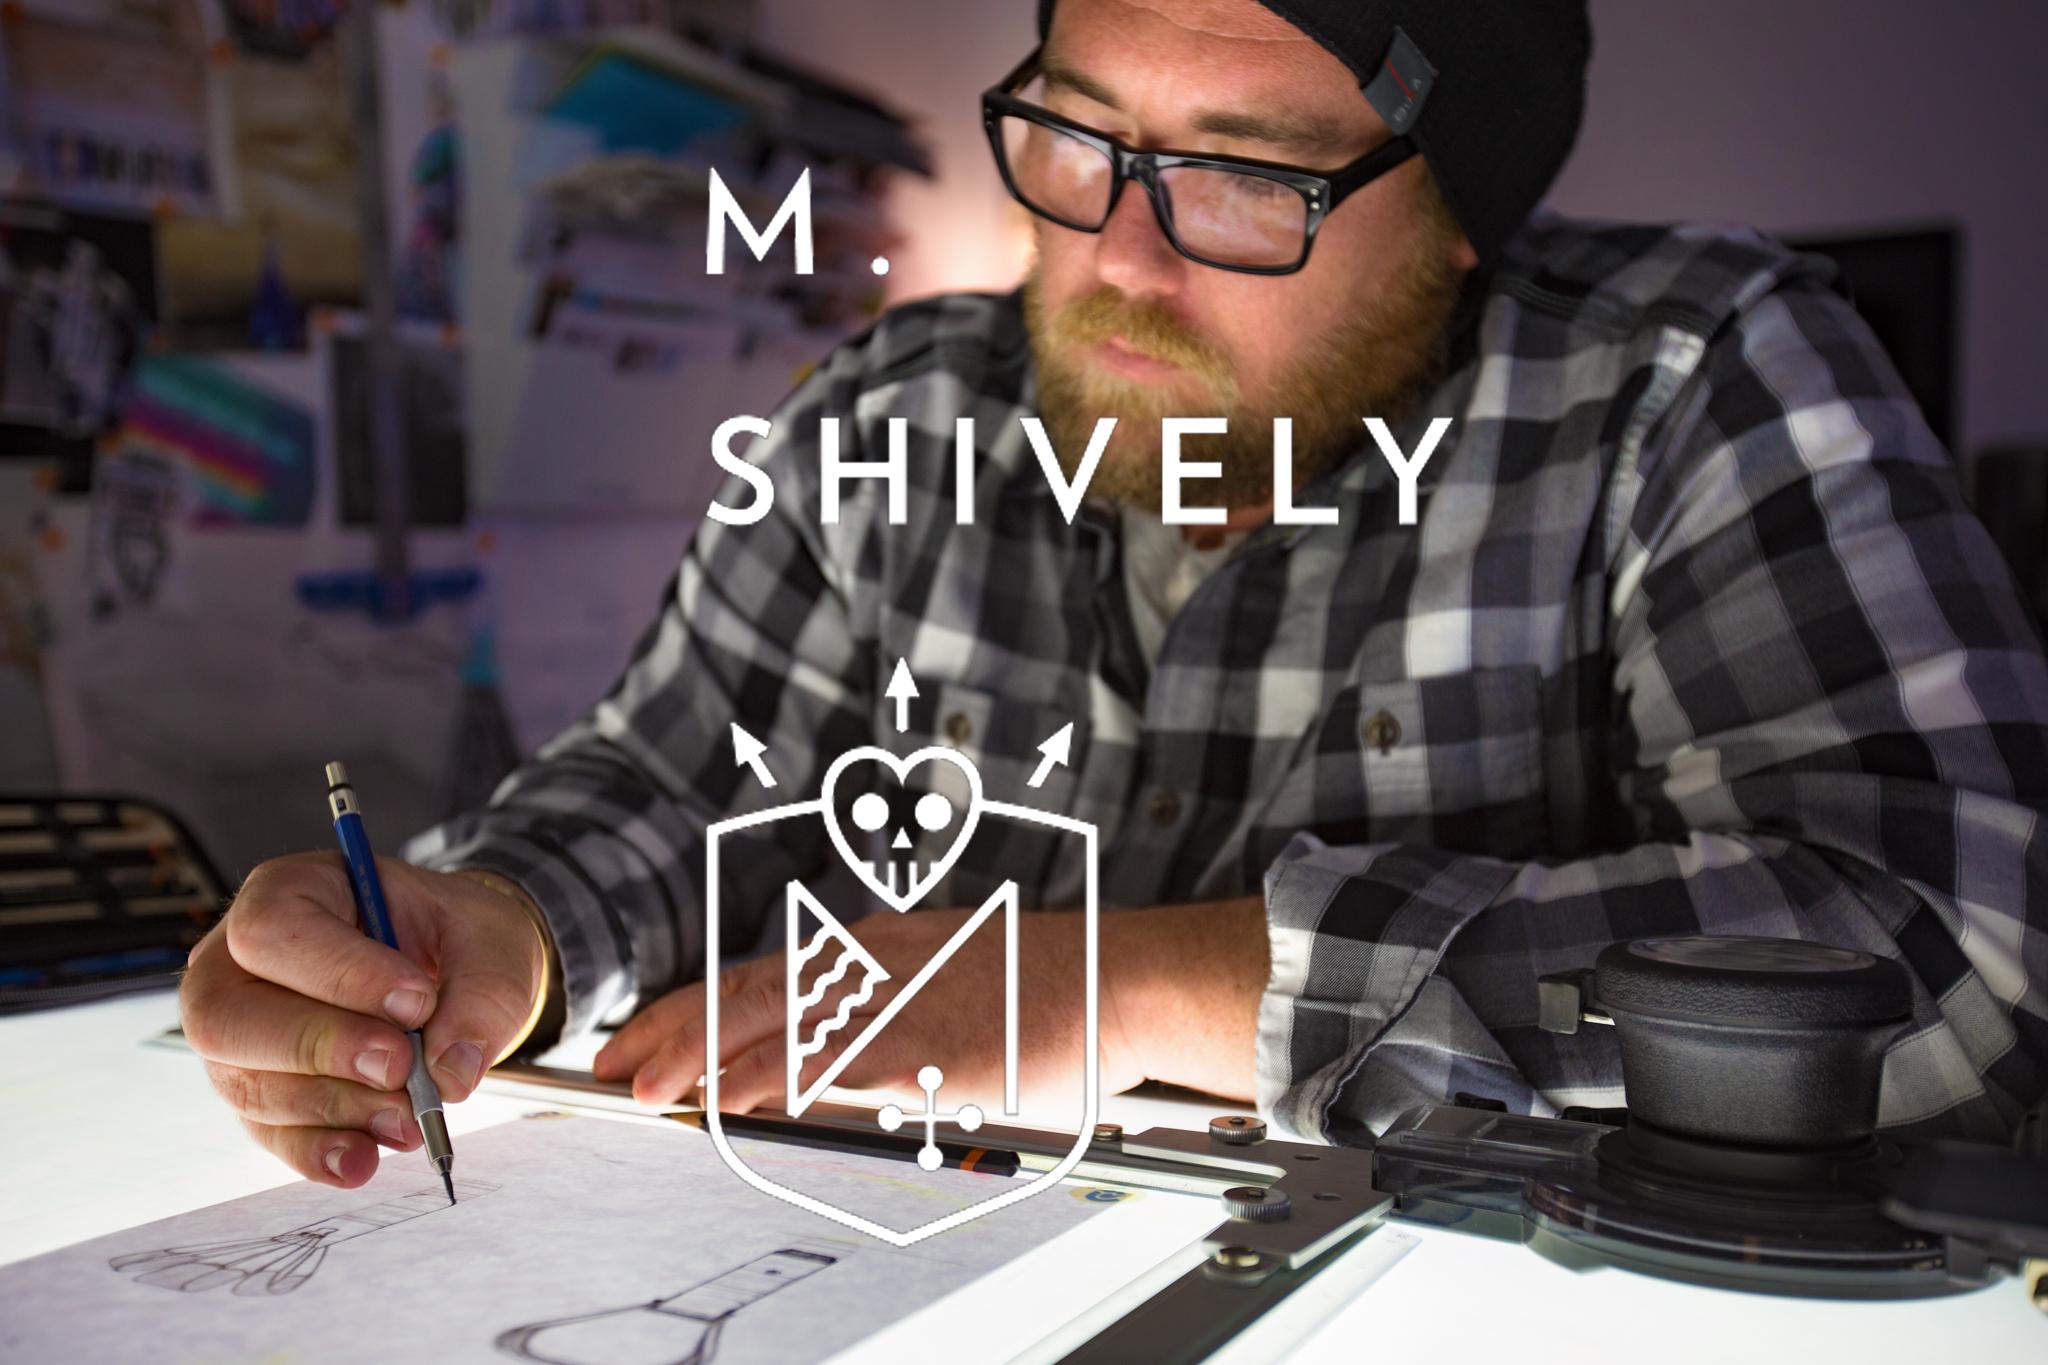 1_M Shivley.png